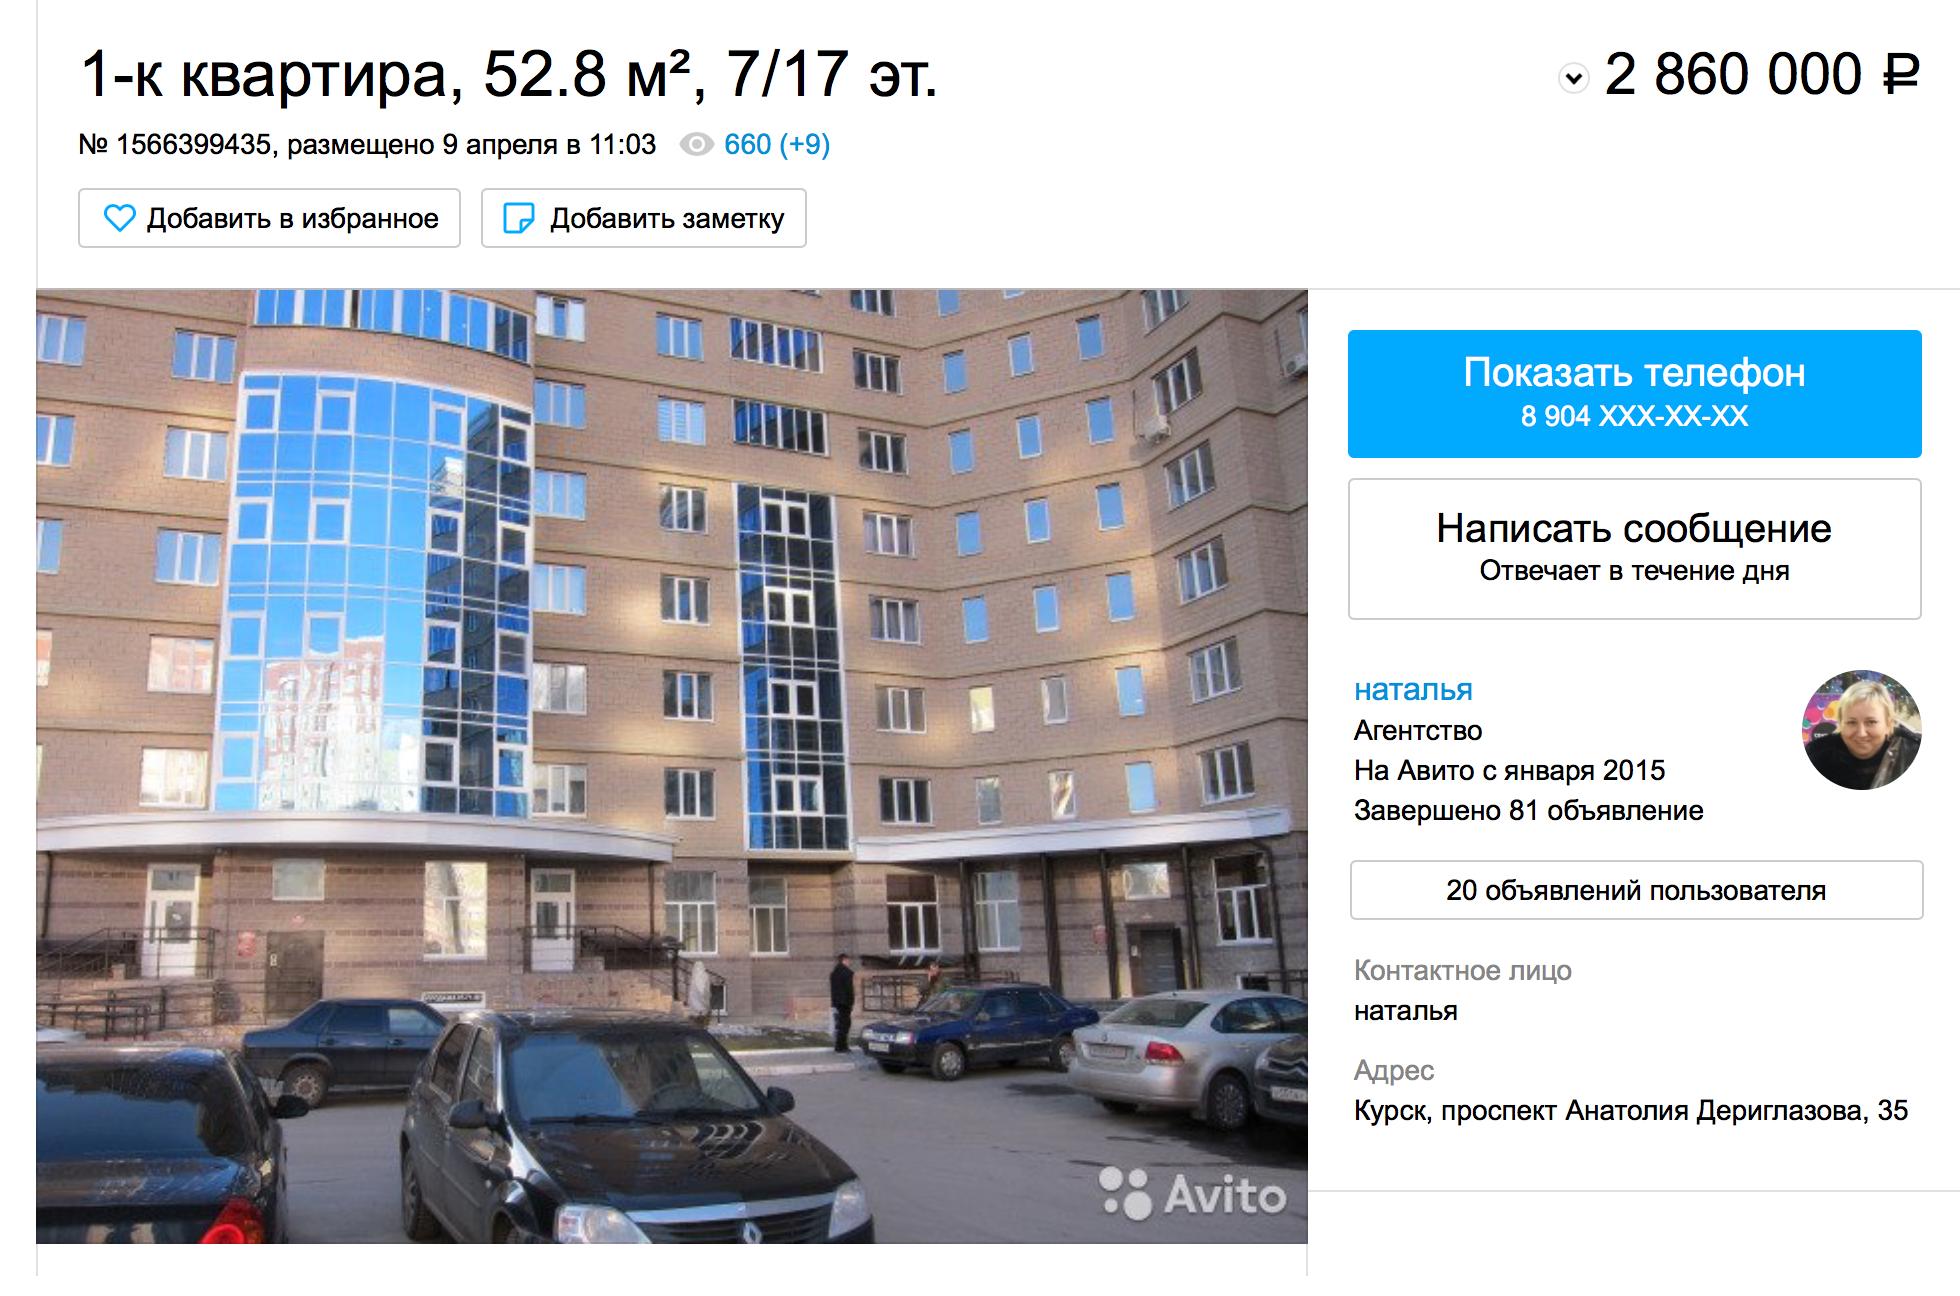 Перекупщики продают однушки в том же доме на «Авито». Цена на 300 000<span class=ruble>Р</span> выше, а площадь на 10 кв. м меньше